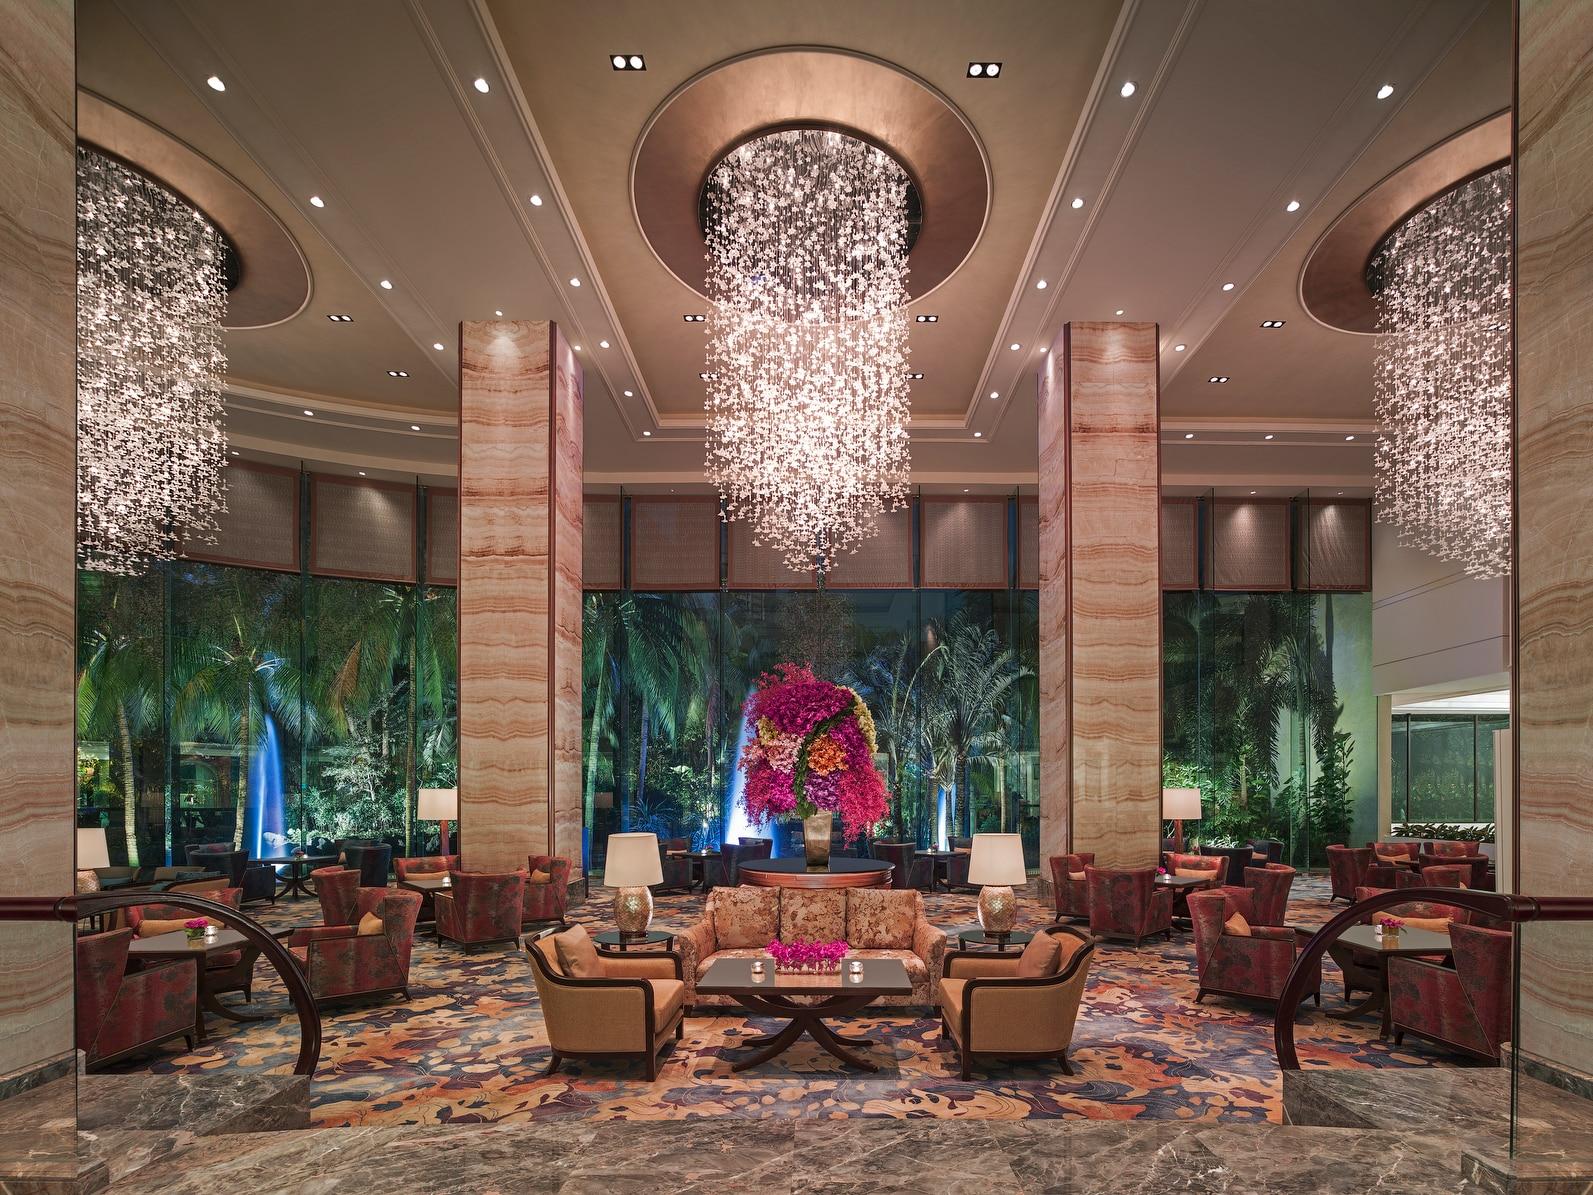 Lobby and lounge area of Shangri-la EDSA Hotel